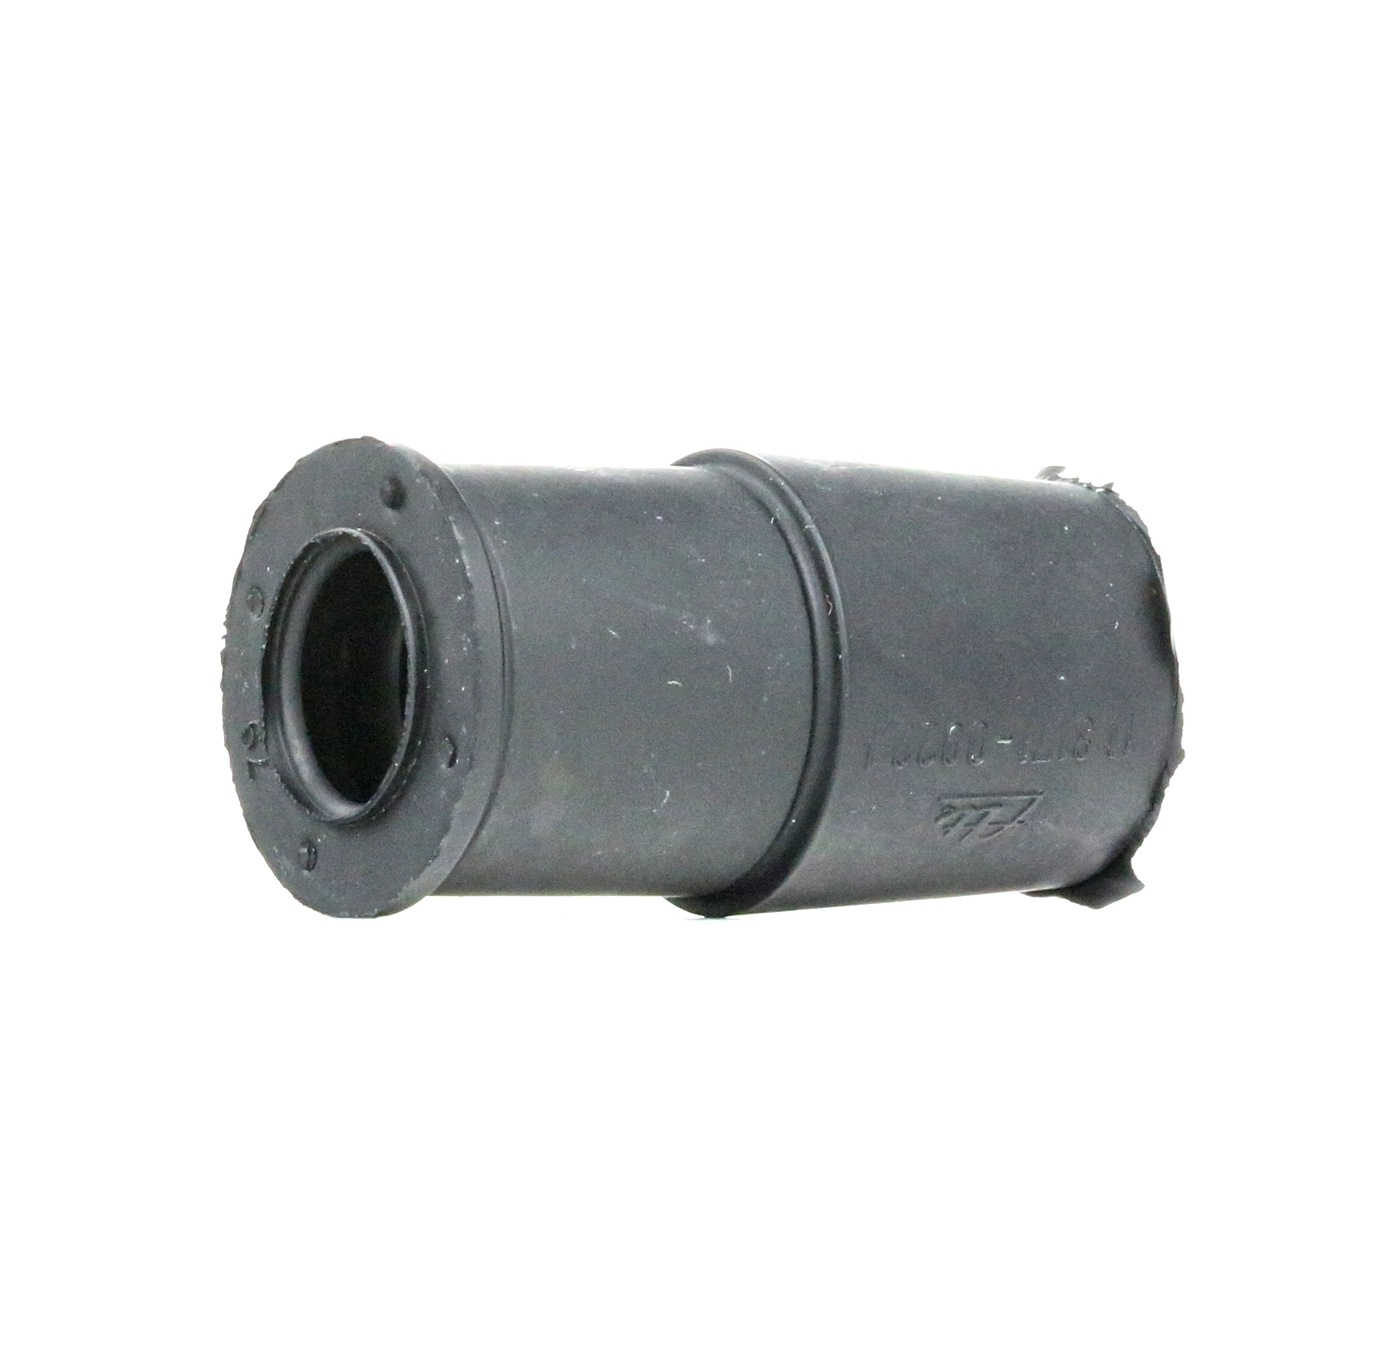 Guide Sleeve, brake caliper ATE 11.8171-0022.1 rating